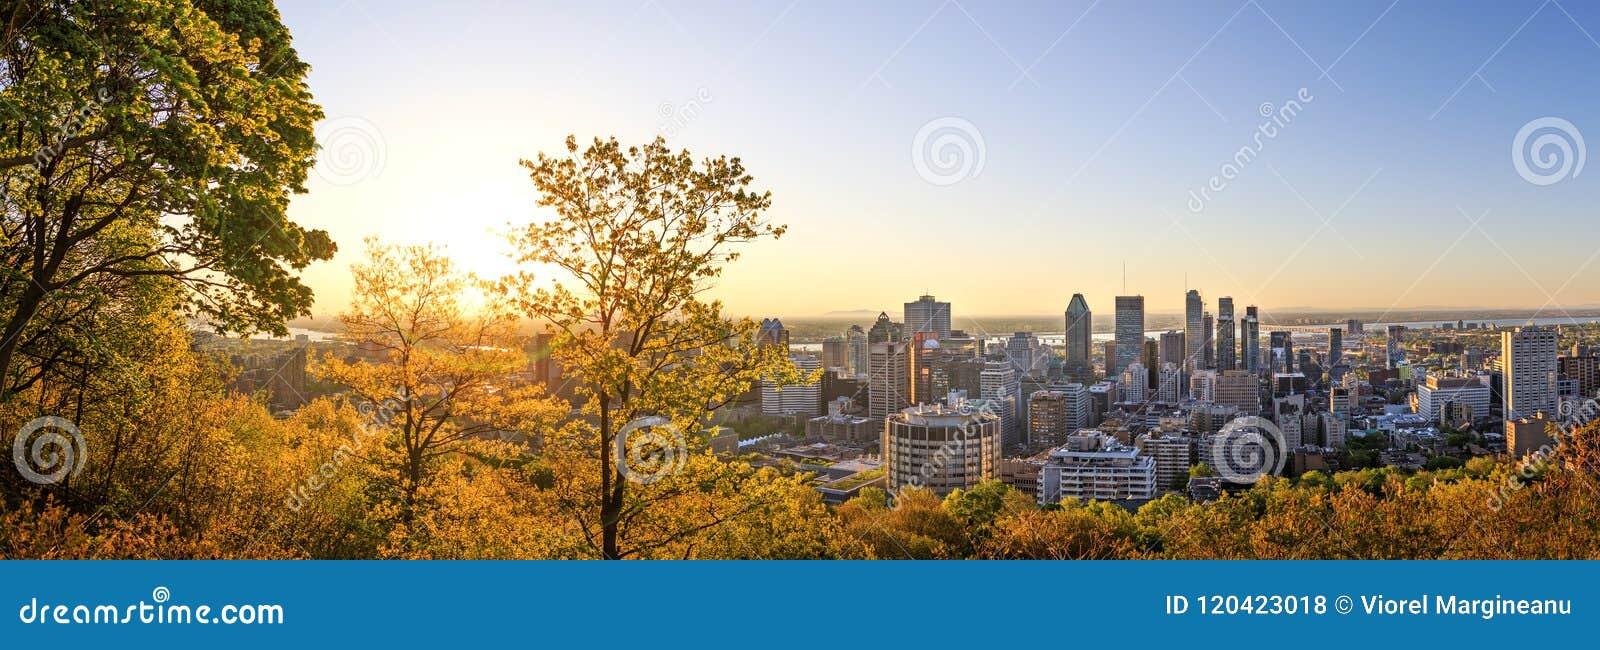 "Montreal, Canada †""21 Mei 2018 Mooie gouden zonsopgang over"